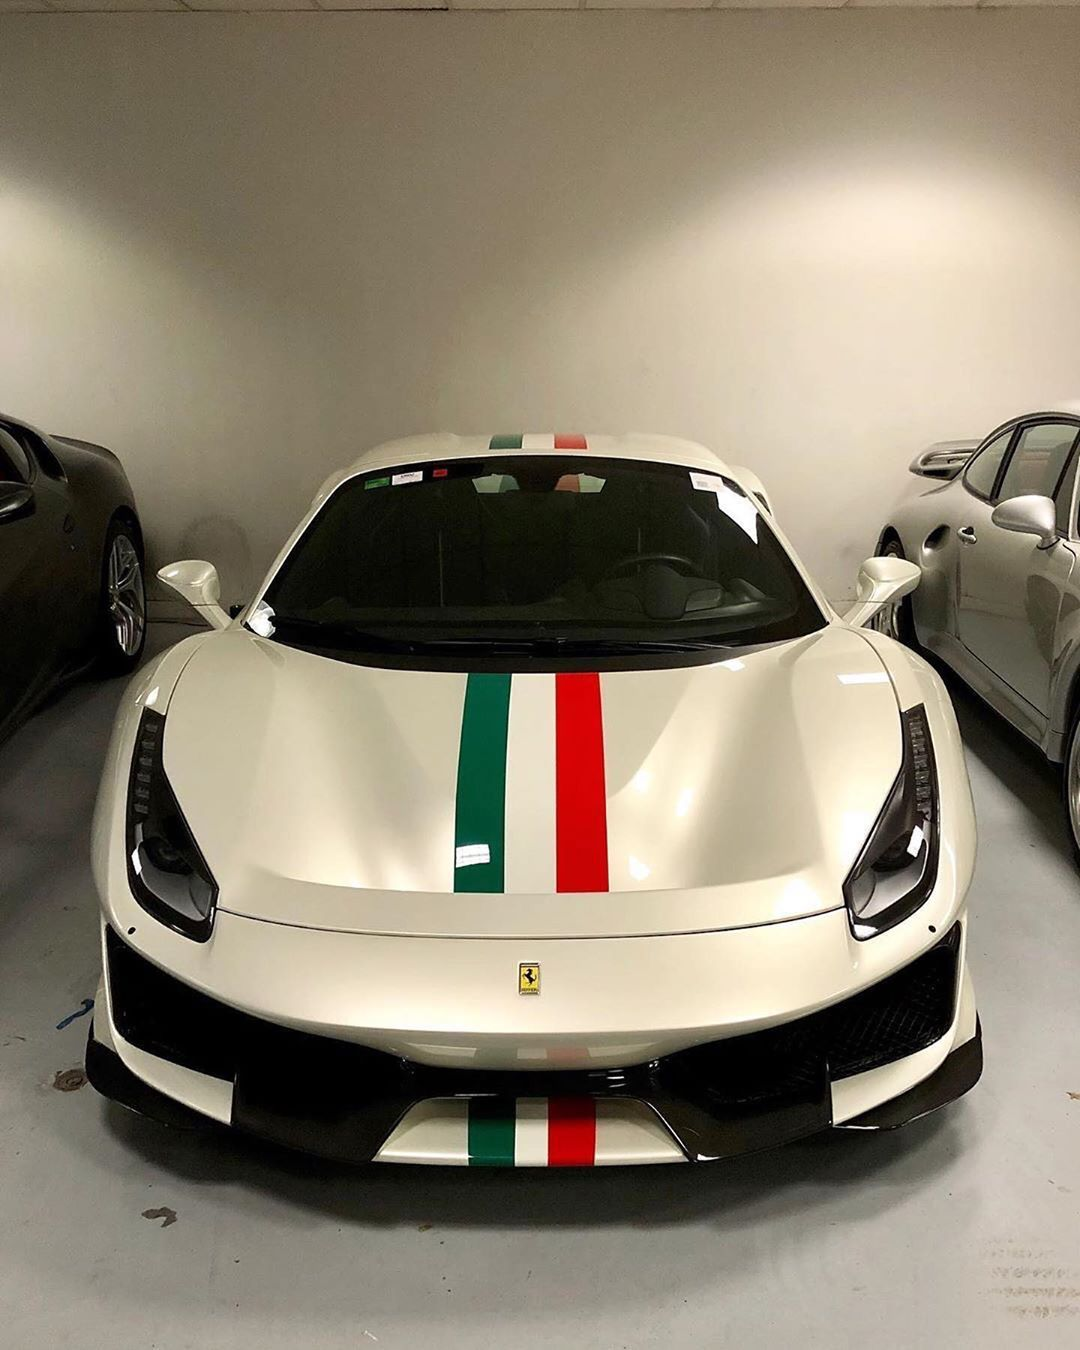 Instagram Limited Supercars On Instagram Italian Stripe 488pista Spider Follow Us For More Ferrari Ferrari 488 Super Cars